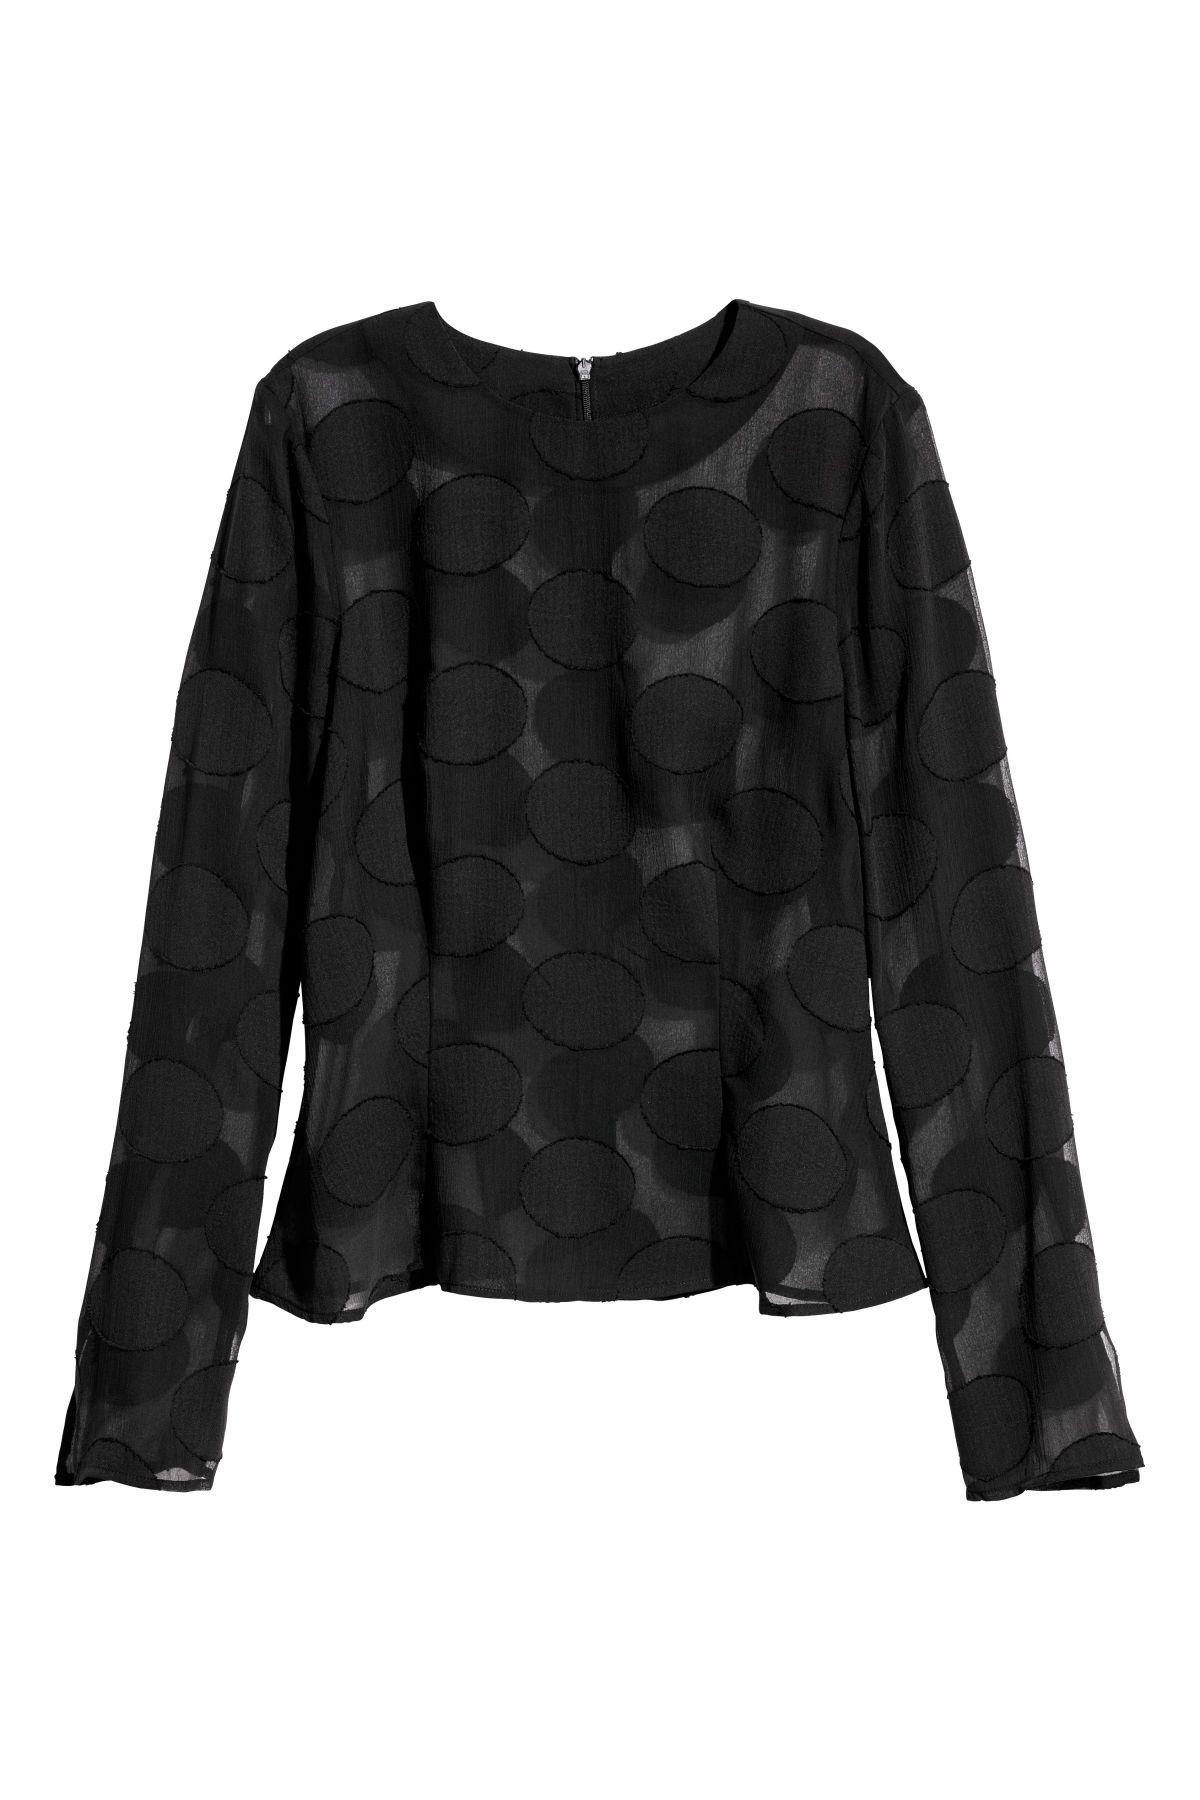 b533de39 Long-sleeved Top | Black/jacquard | WOMEN | H&M US | Fashion | Tops ...